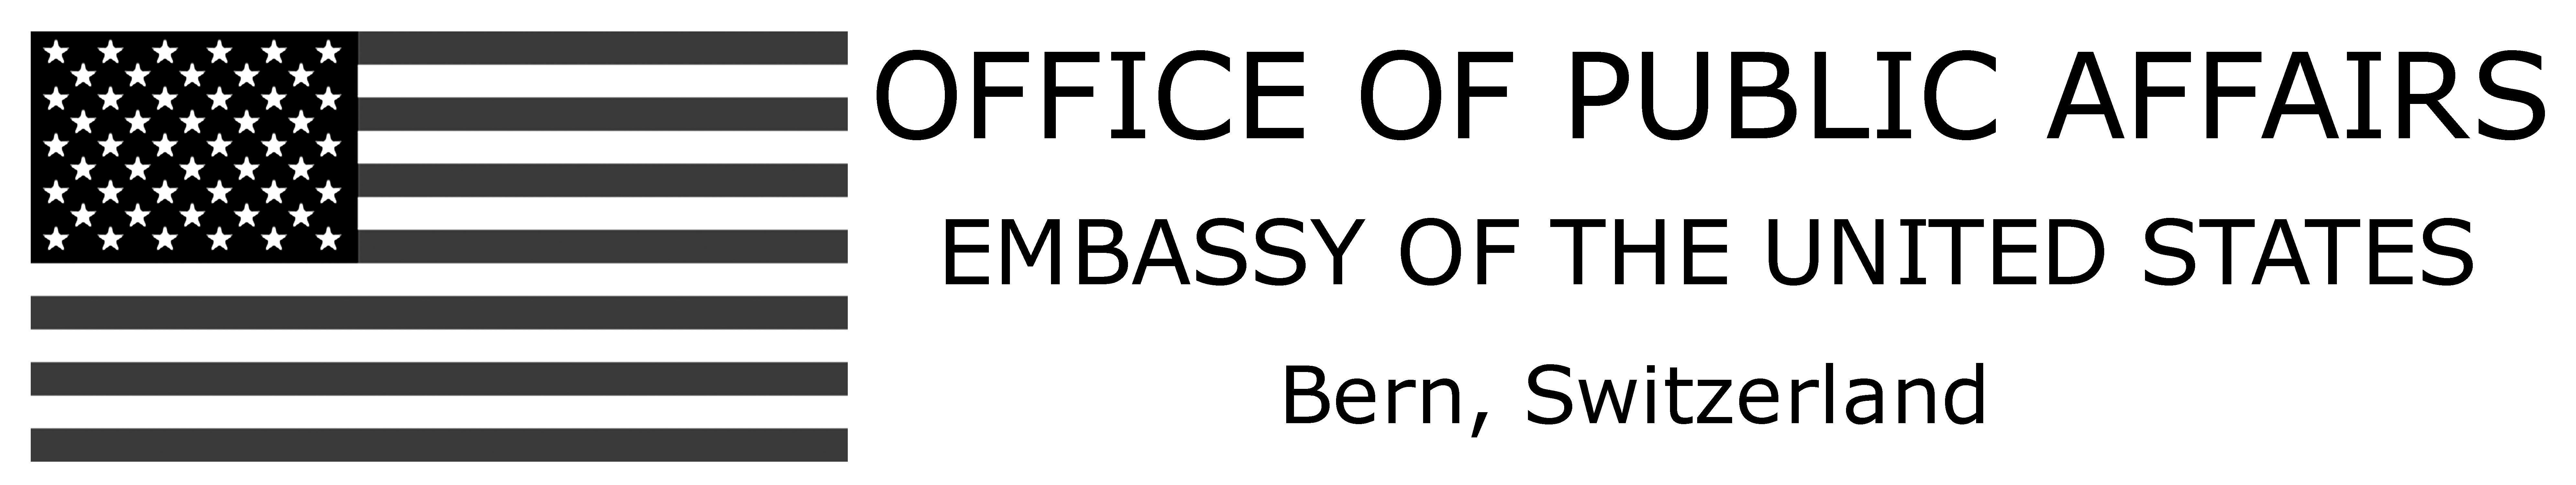 1 US Embassy 2021 04 28 122127